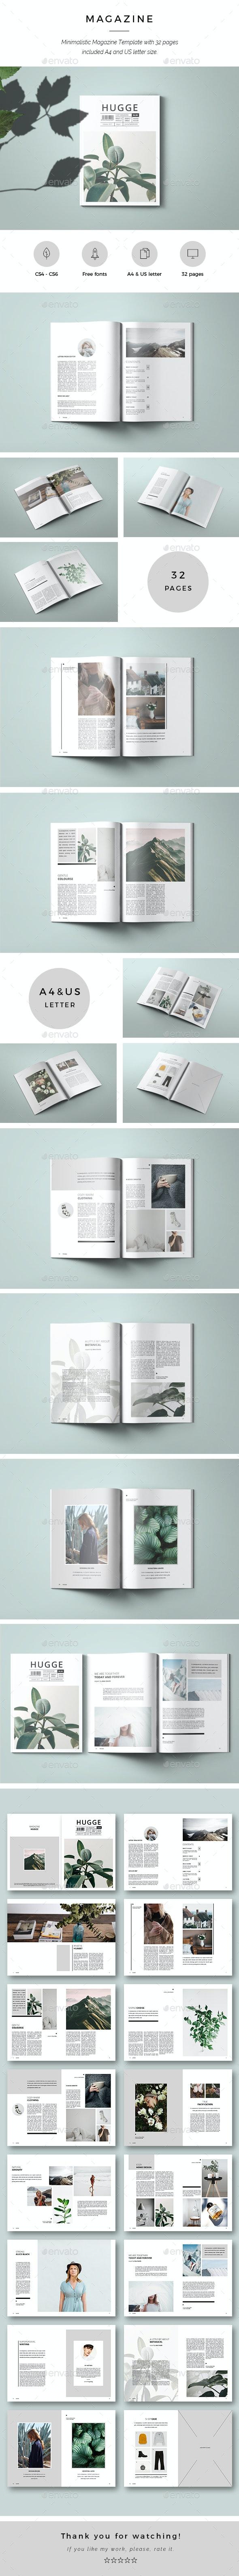 Hugge Minimal Magazine - Magazines Print Templates